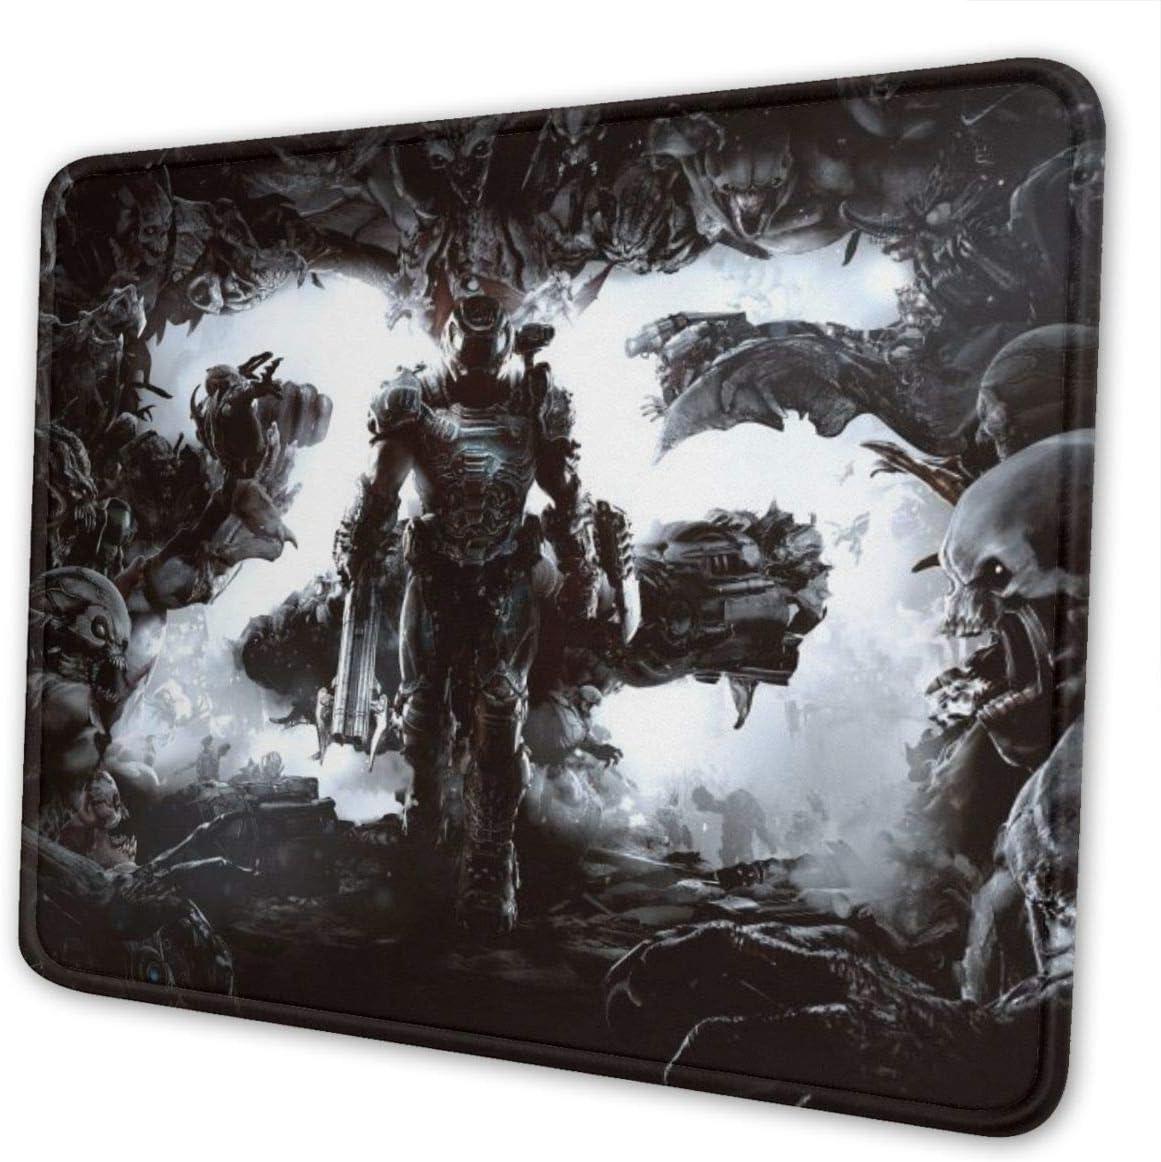 Vulpecula gamer mouse pad mat